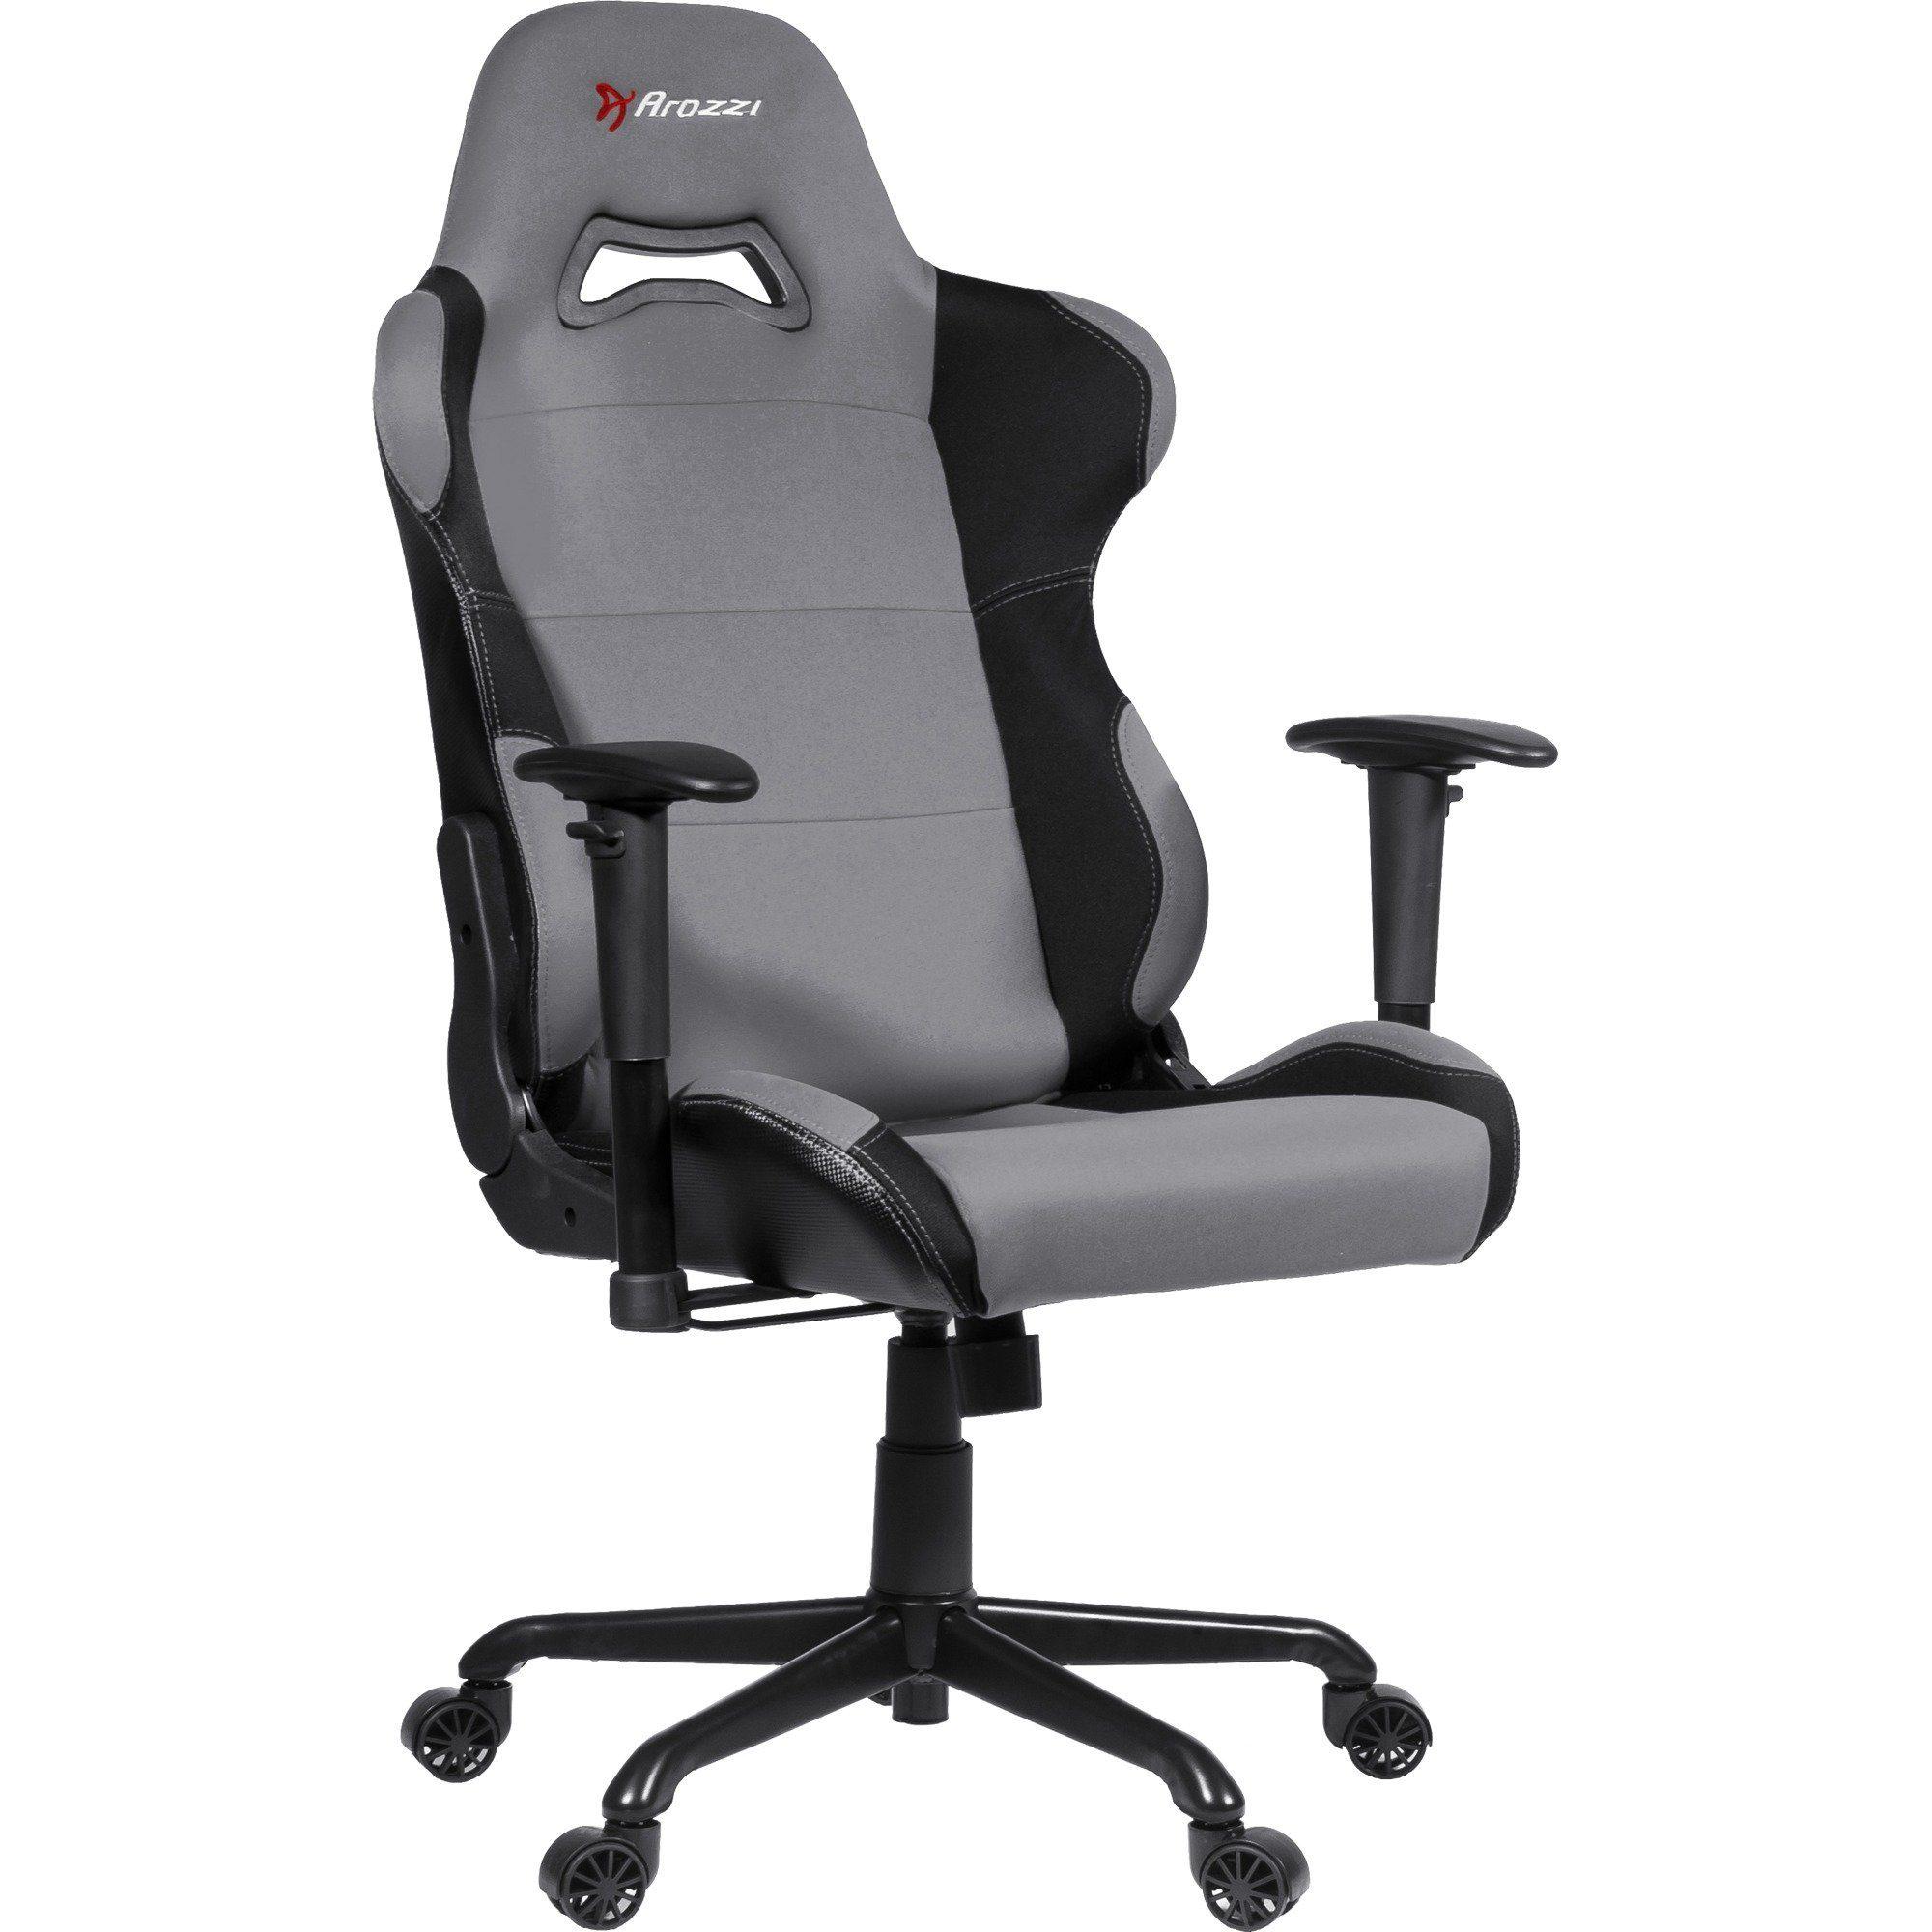 Arozzi Spielsitz »Torretta Gaming Chair XL«